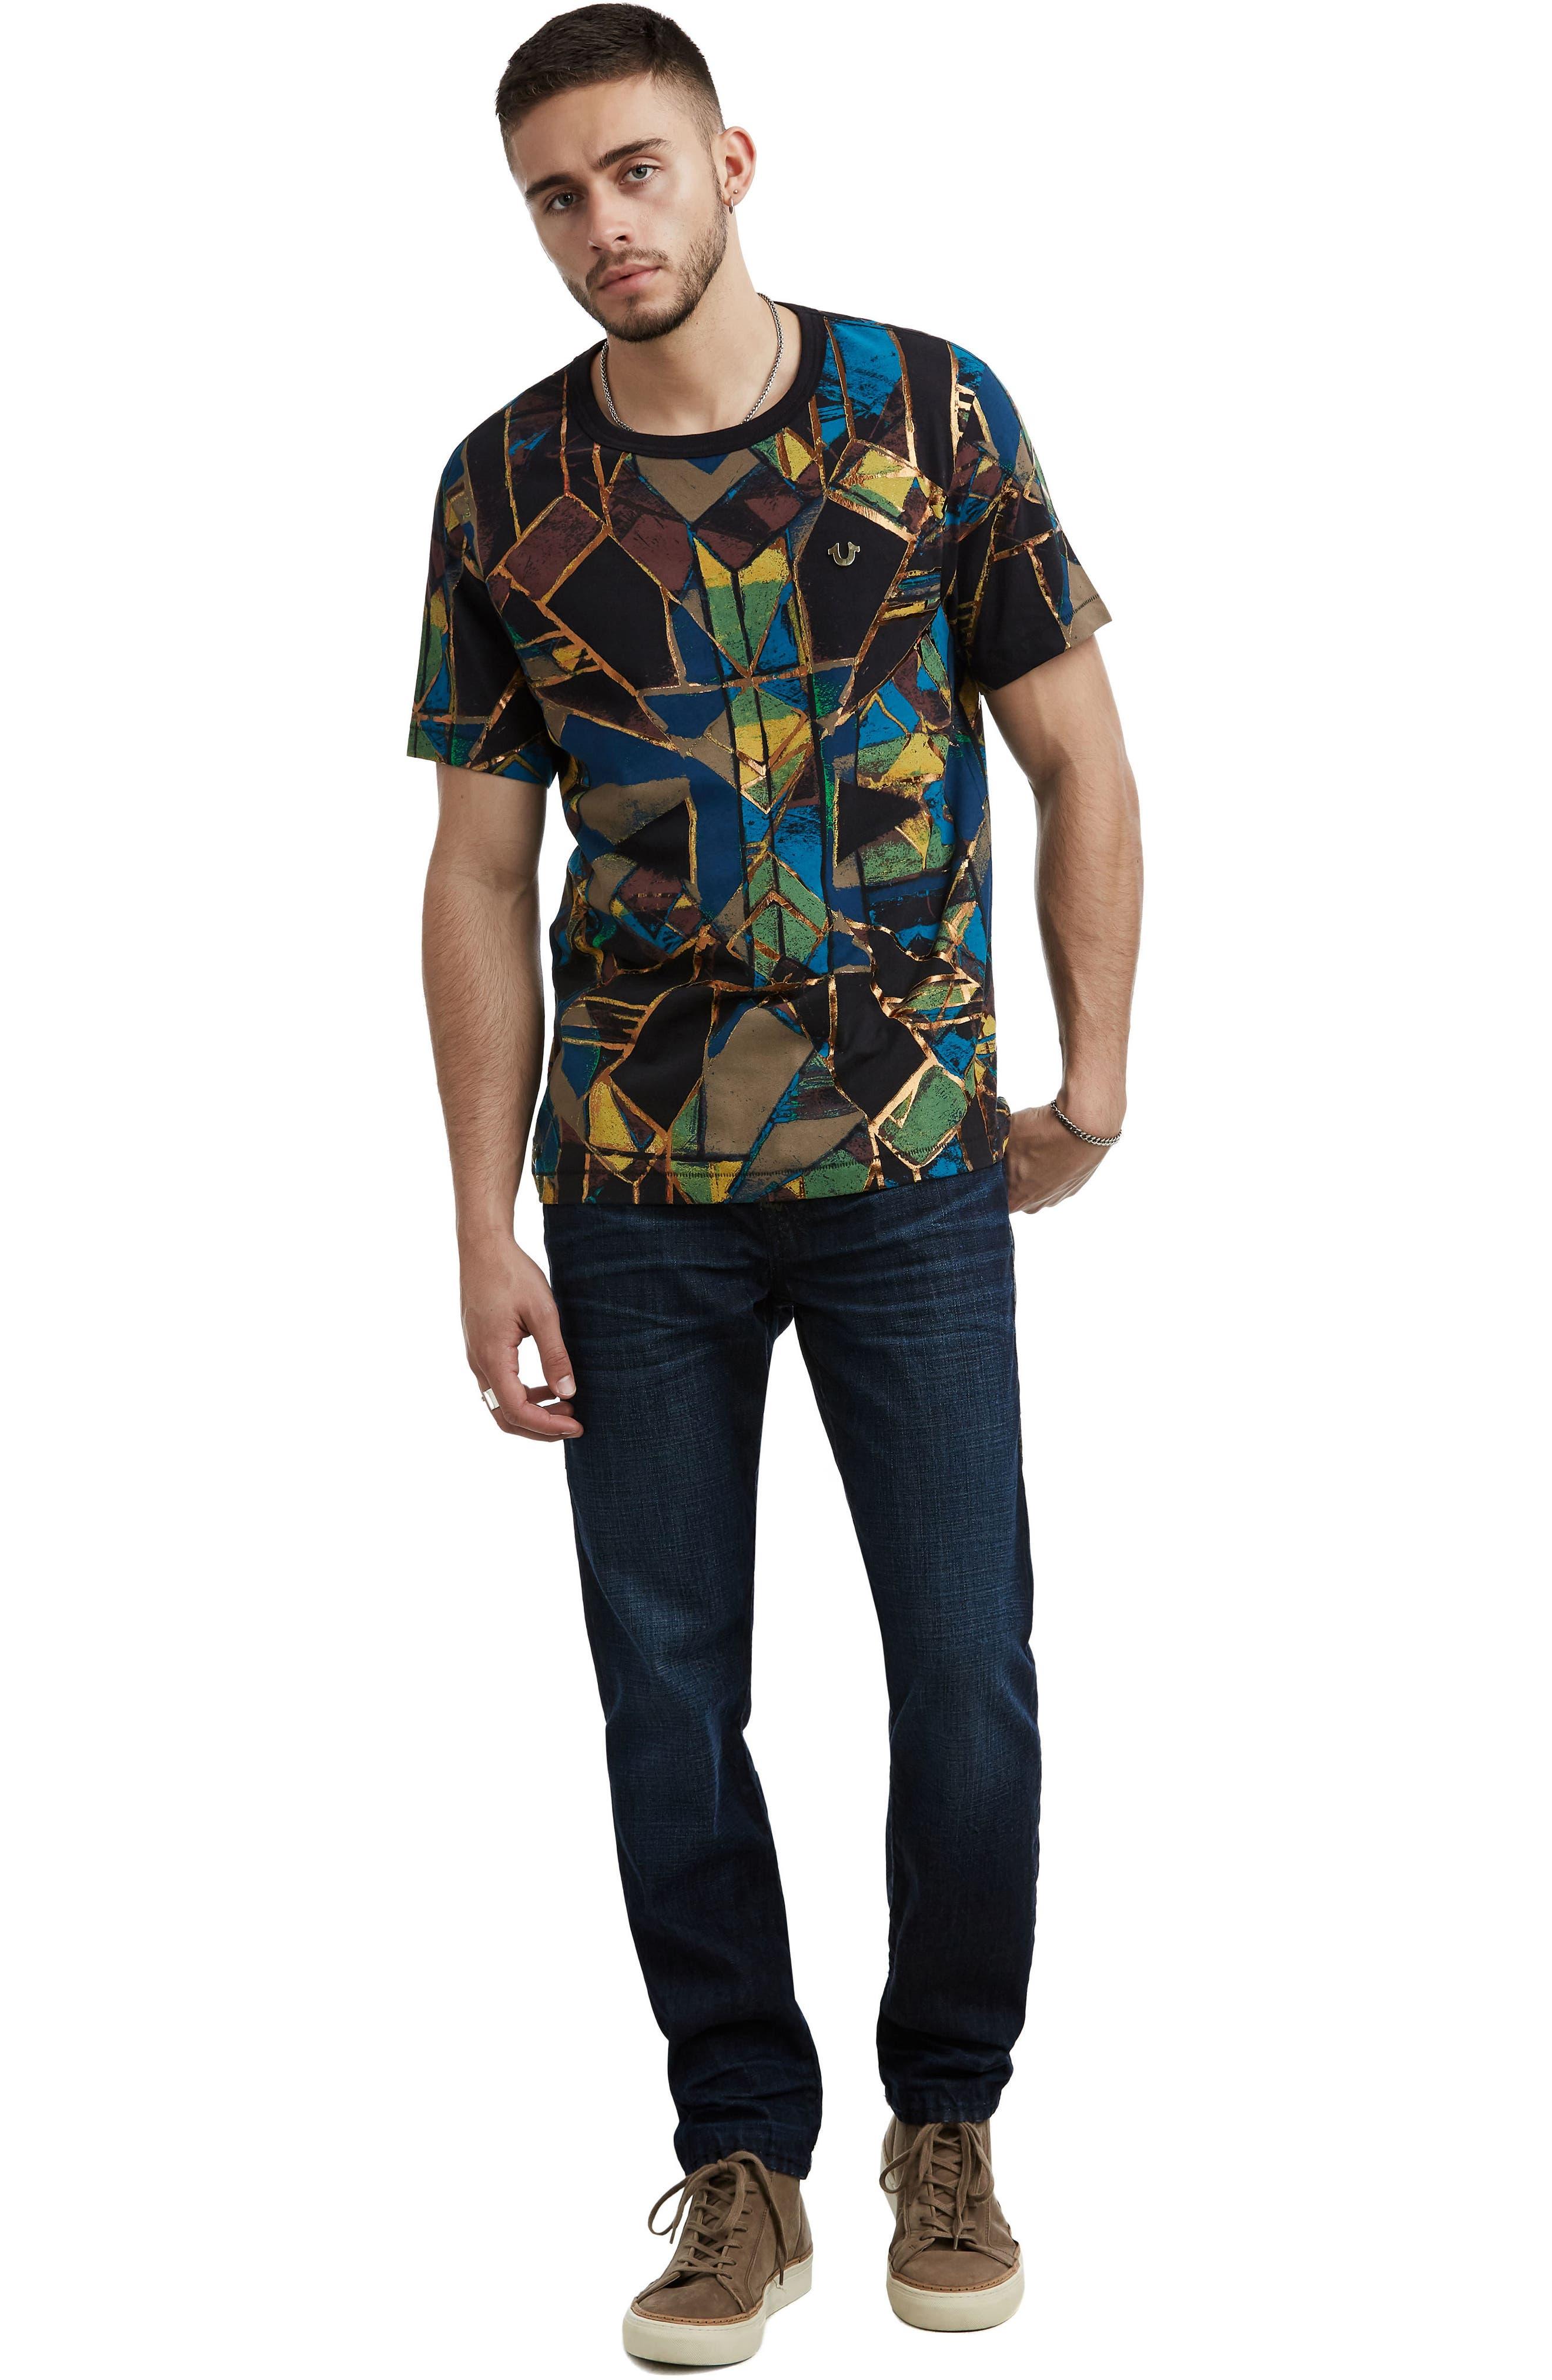 Limelight Graphic T-Shirt,                             Alternate thumbnail 3, color,                             BLACK MULTI